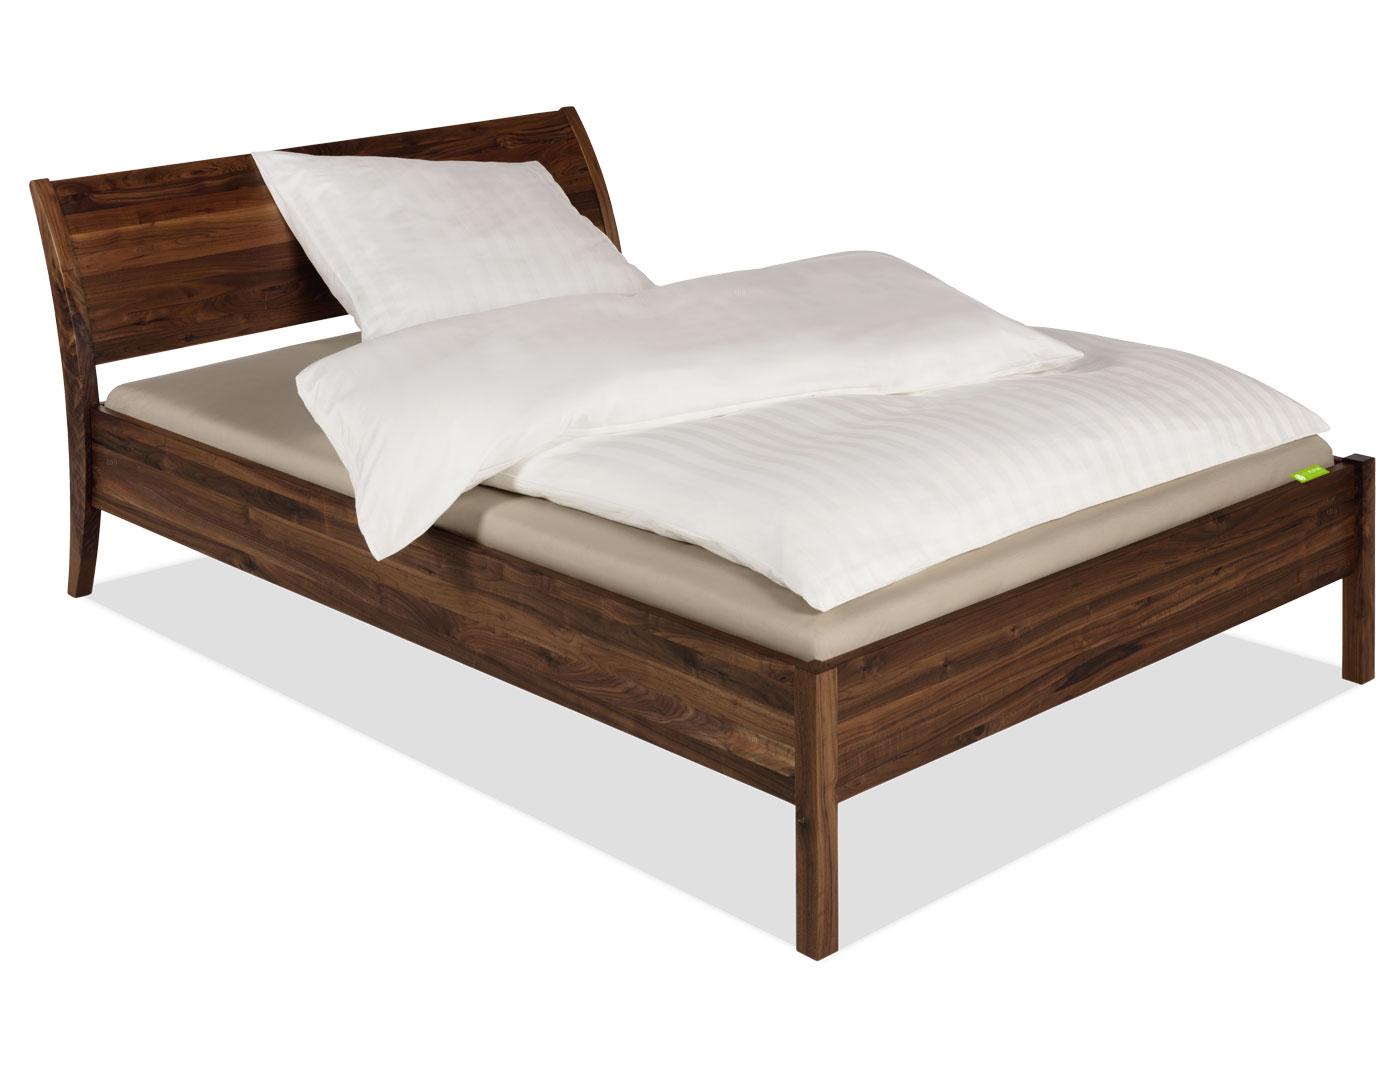 Full Size of Tojo V Bett Bett  Matratzen Gebraucht Kaufen Erfahrung System Erfahrungen Erfahrungsbericht Preisvergleich Selber Bauen V Bett Bettgestell (180 X 190 Cm) Lieg Bett Tojo V Bett